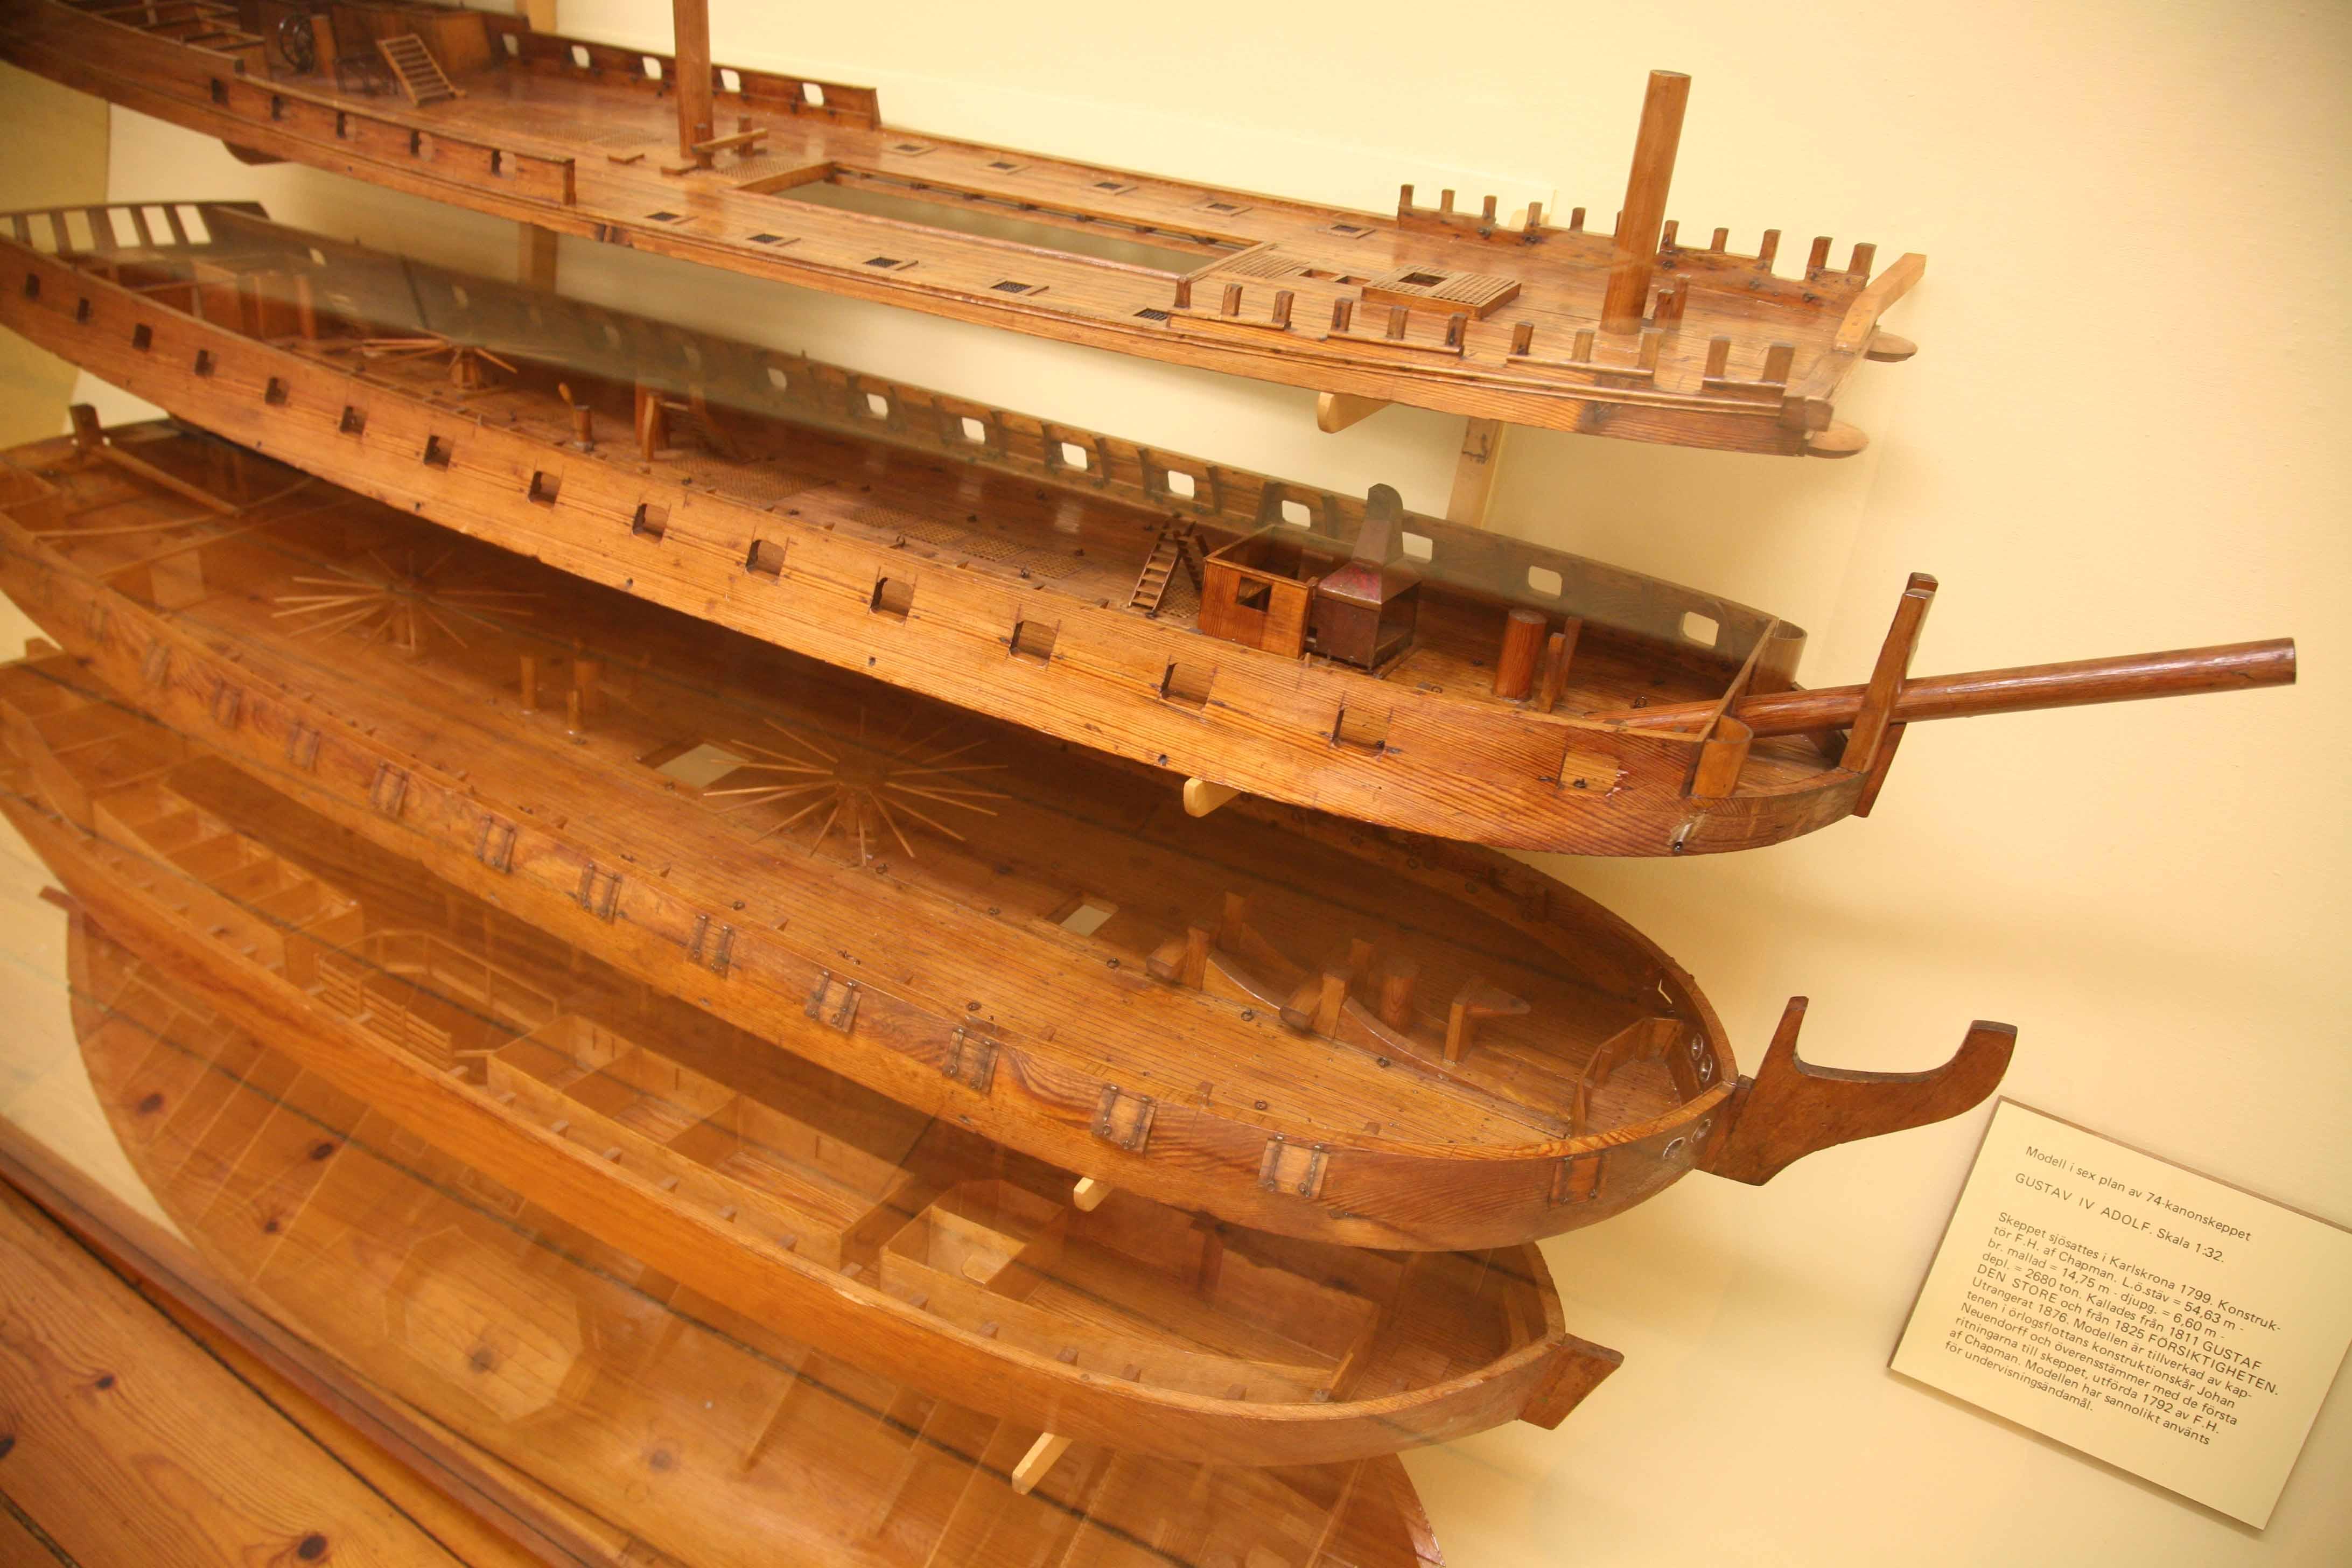 photos of of model of the six decks of the 74 gun ship